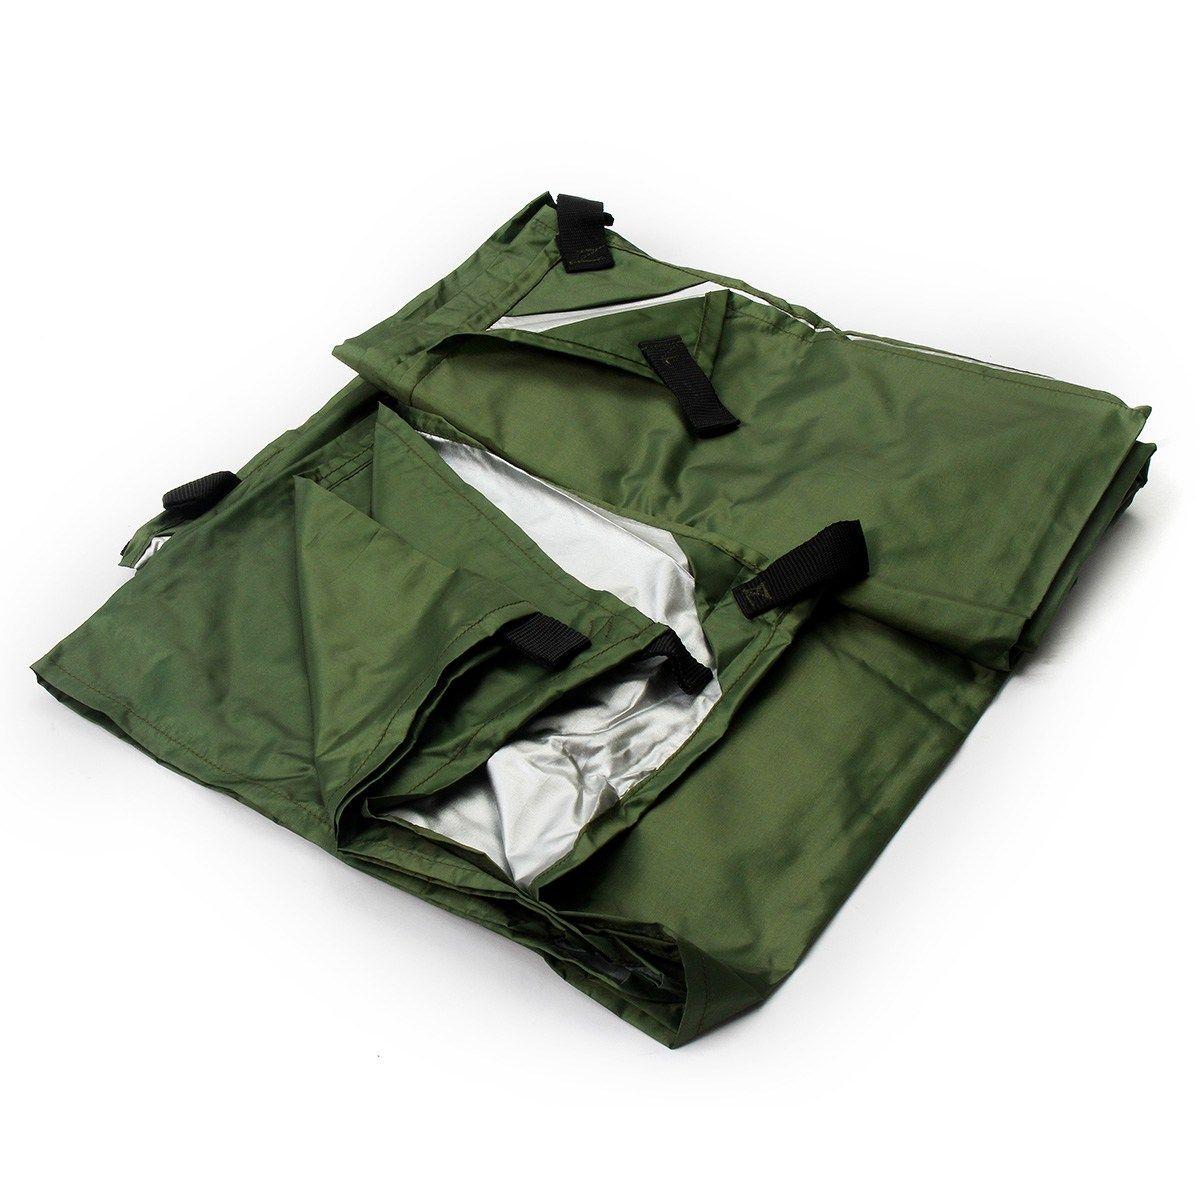 3mx3m Waterproof Sun <font><b>Shelter</b></font> Tarp Survival Camping Climbing Outdoor Tent Patio Sun Shade Awning Canopy Garden tent Shade